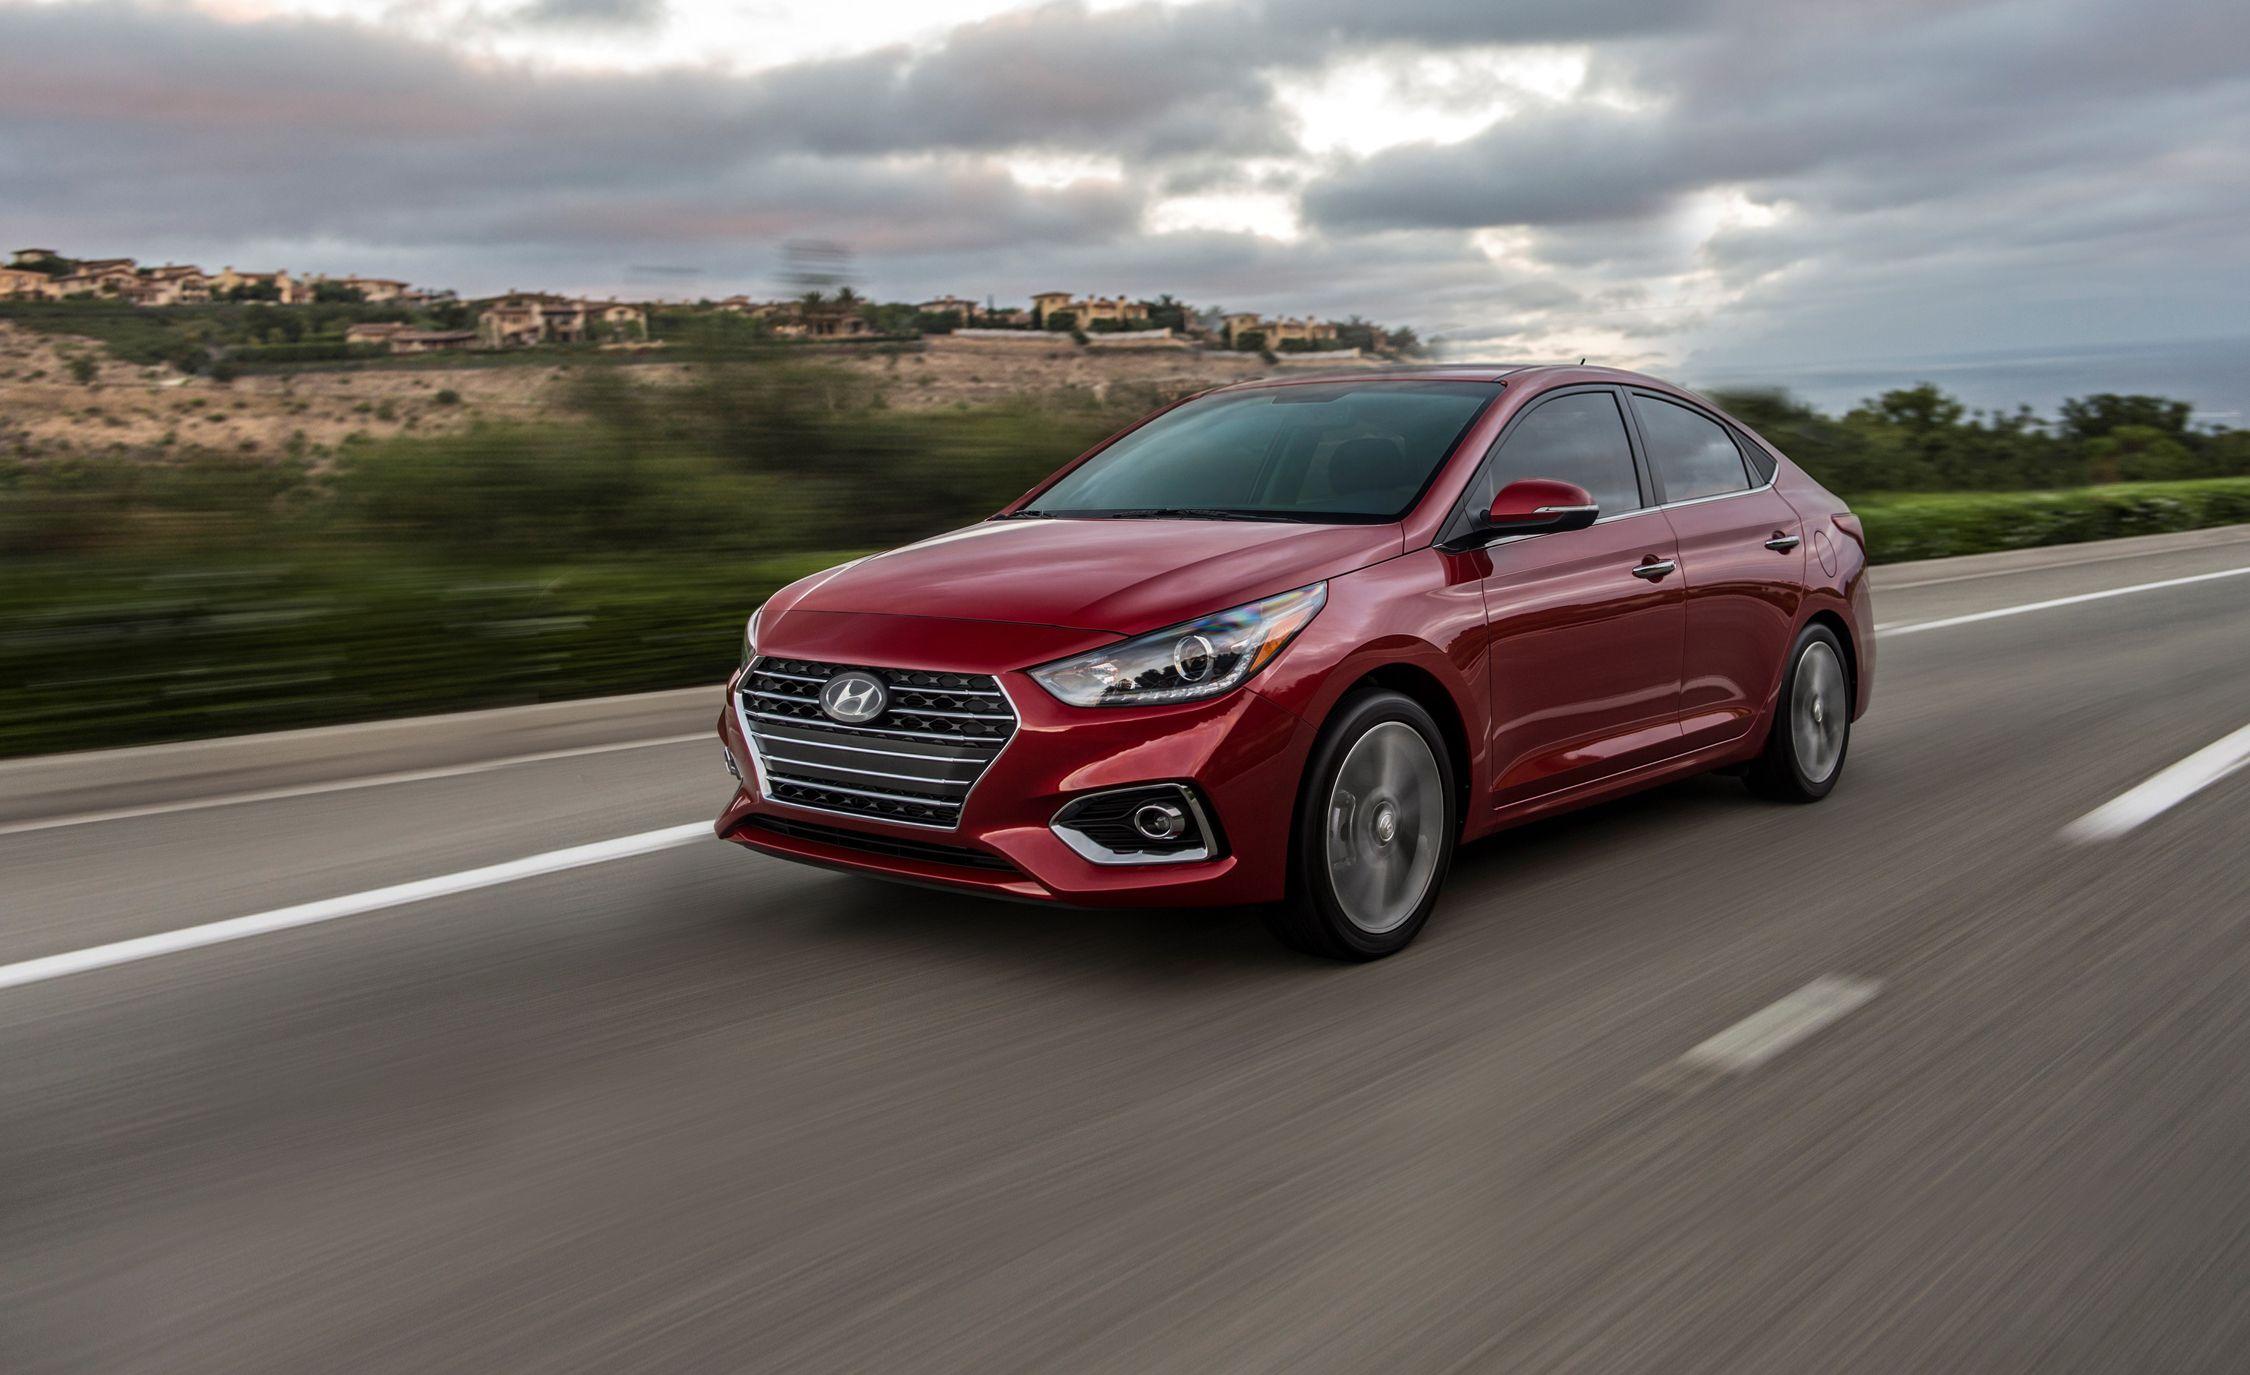 2018 Hyundai Accent: Say Hello To The Elantrau0027s Mini Me